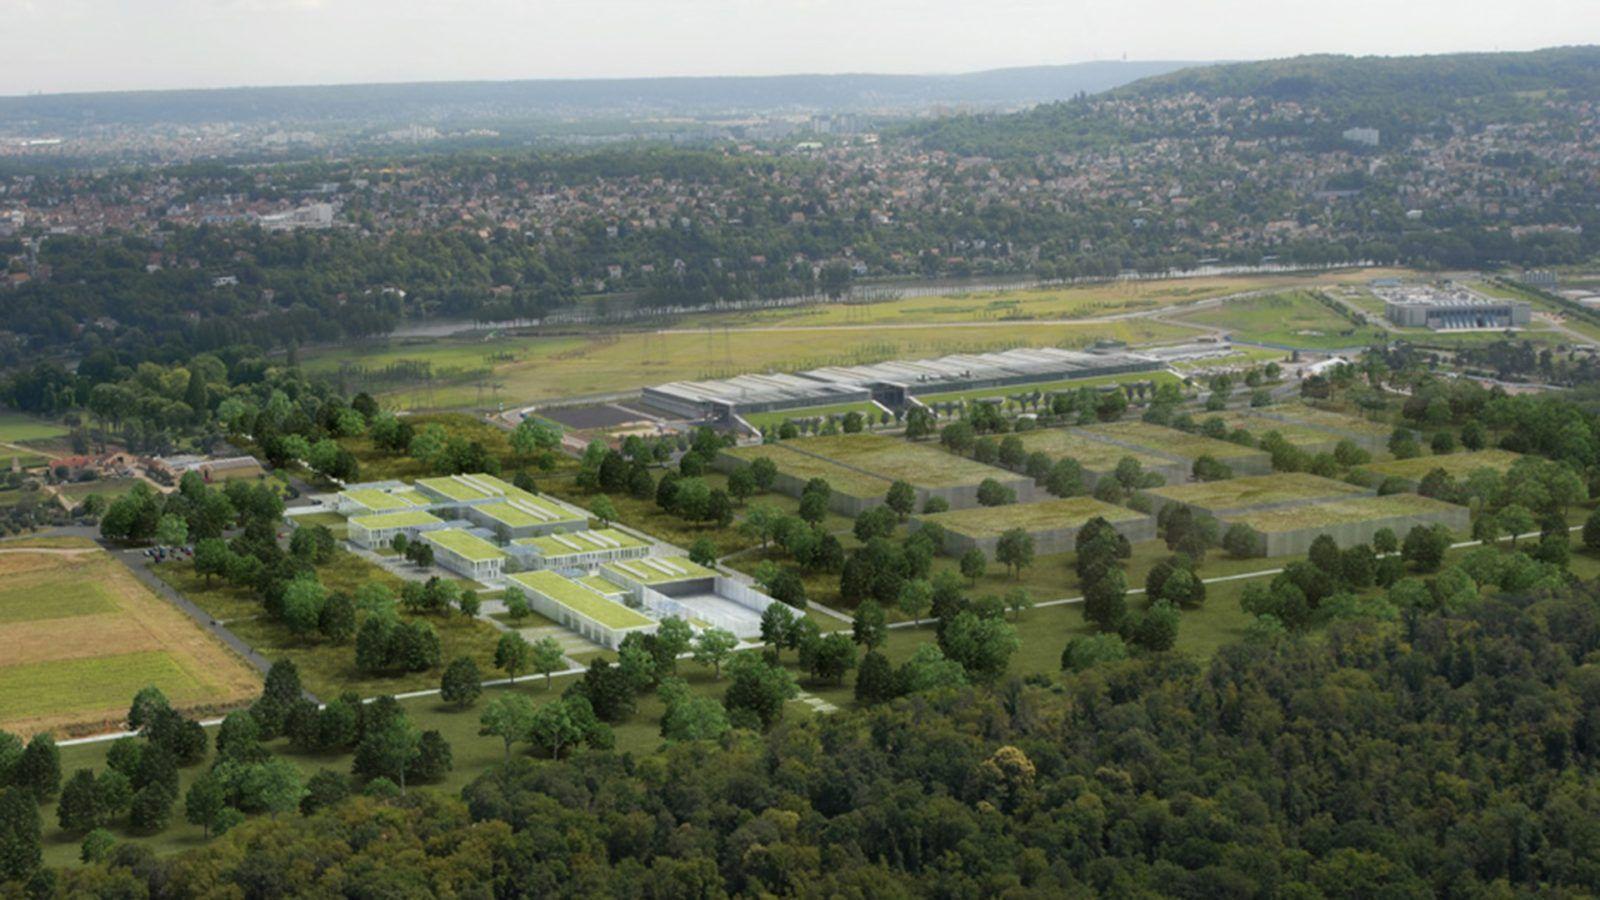 Le Campus du SIAAP - Mutabilis